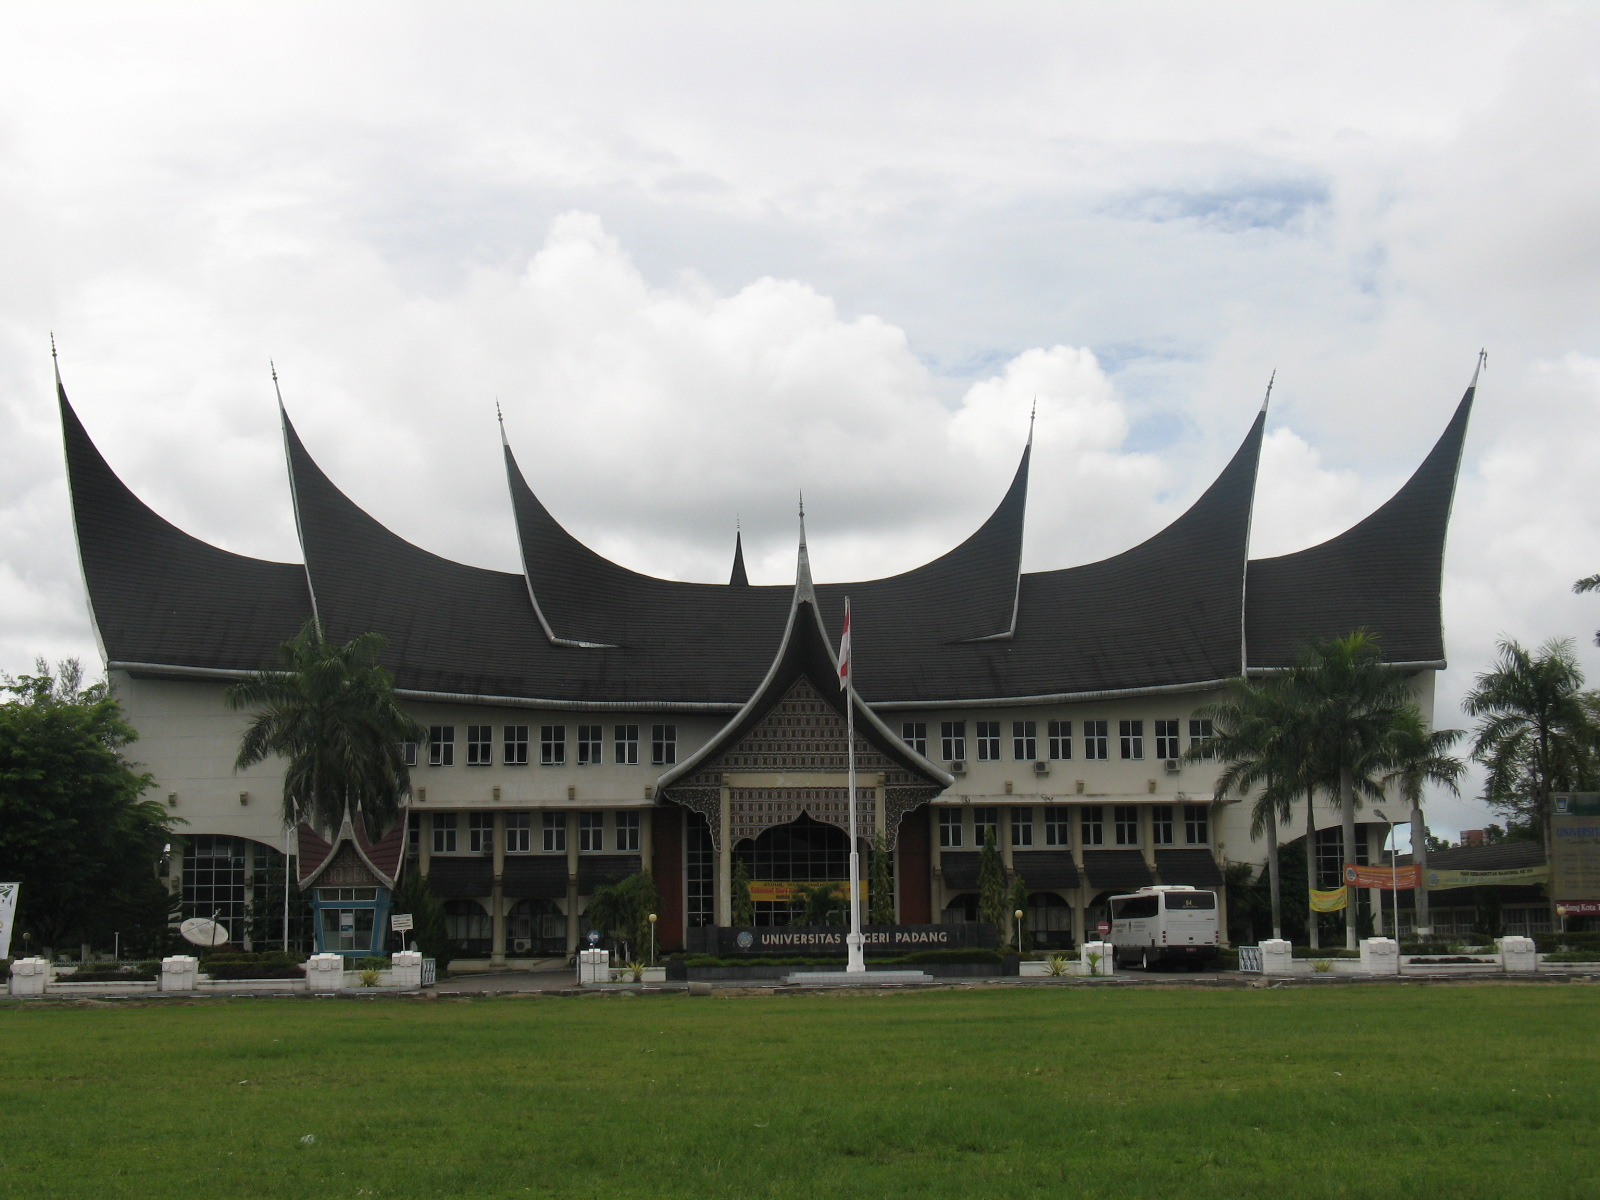 Loker Padang Lowongan Kerja Bp Indonesia Loker Cpns Bumn November 2015 171; Info Unp